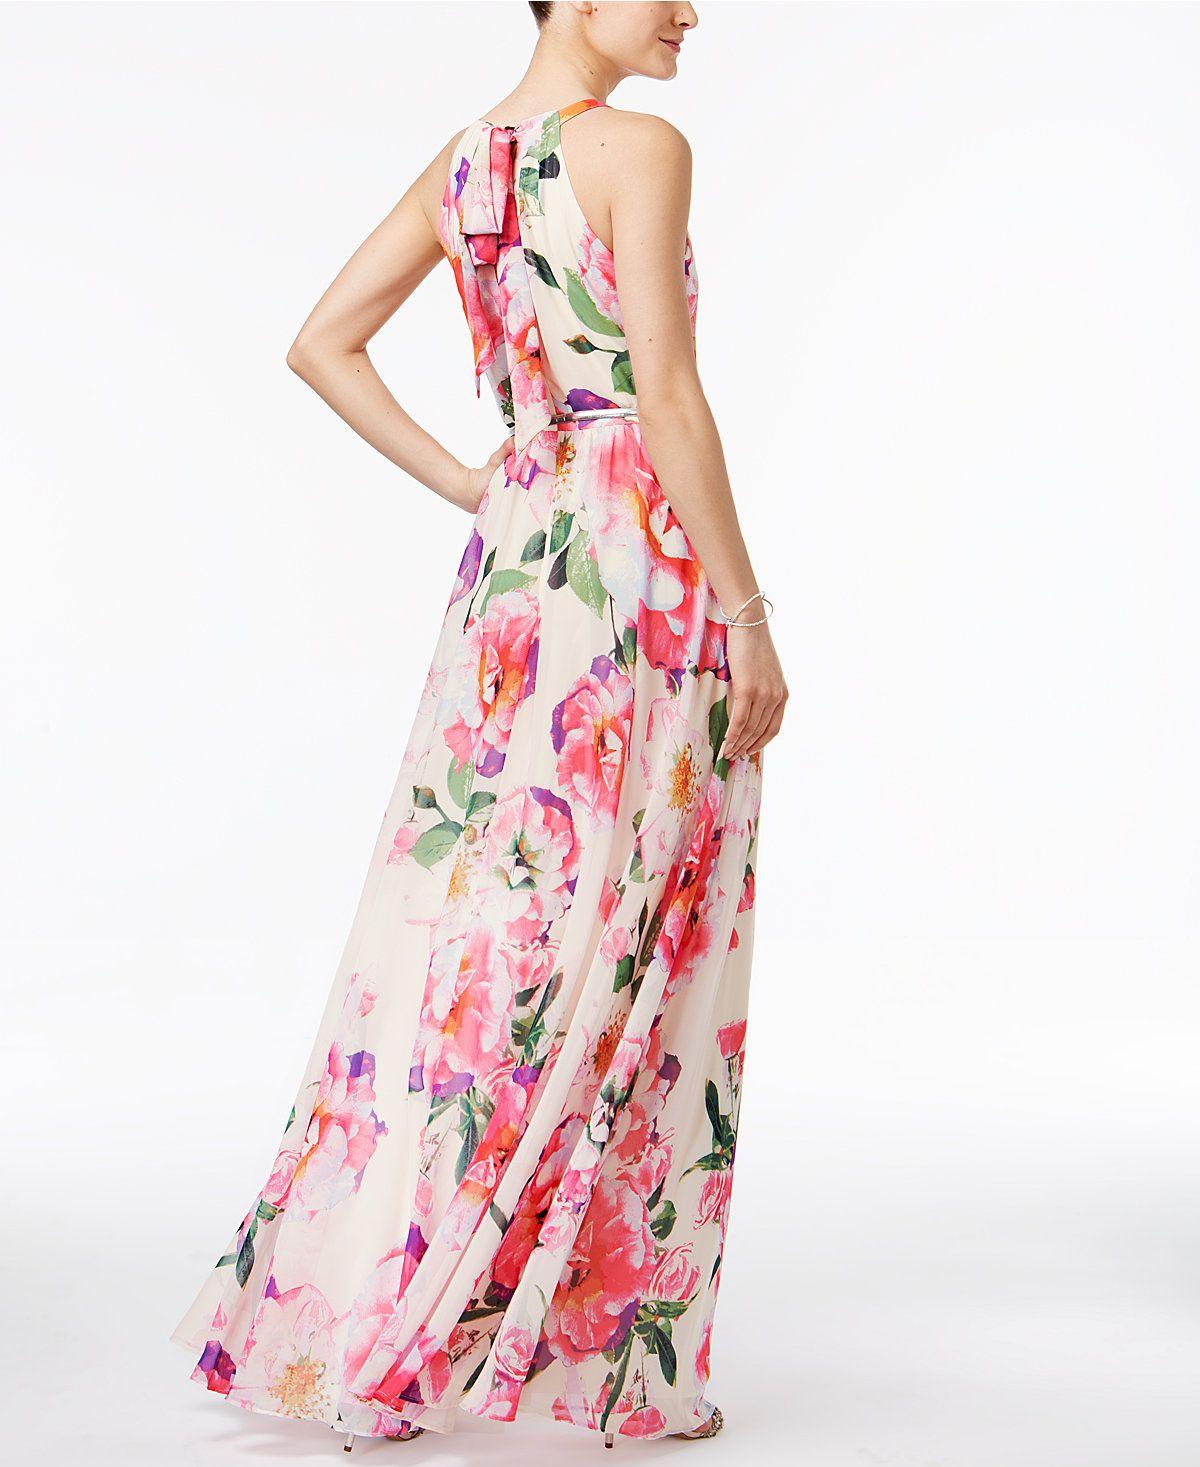 Macys womens dresses wedding  INC International Concepts FloralPrint Maxi Dress Only at Macyus